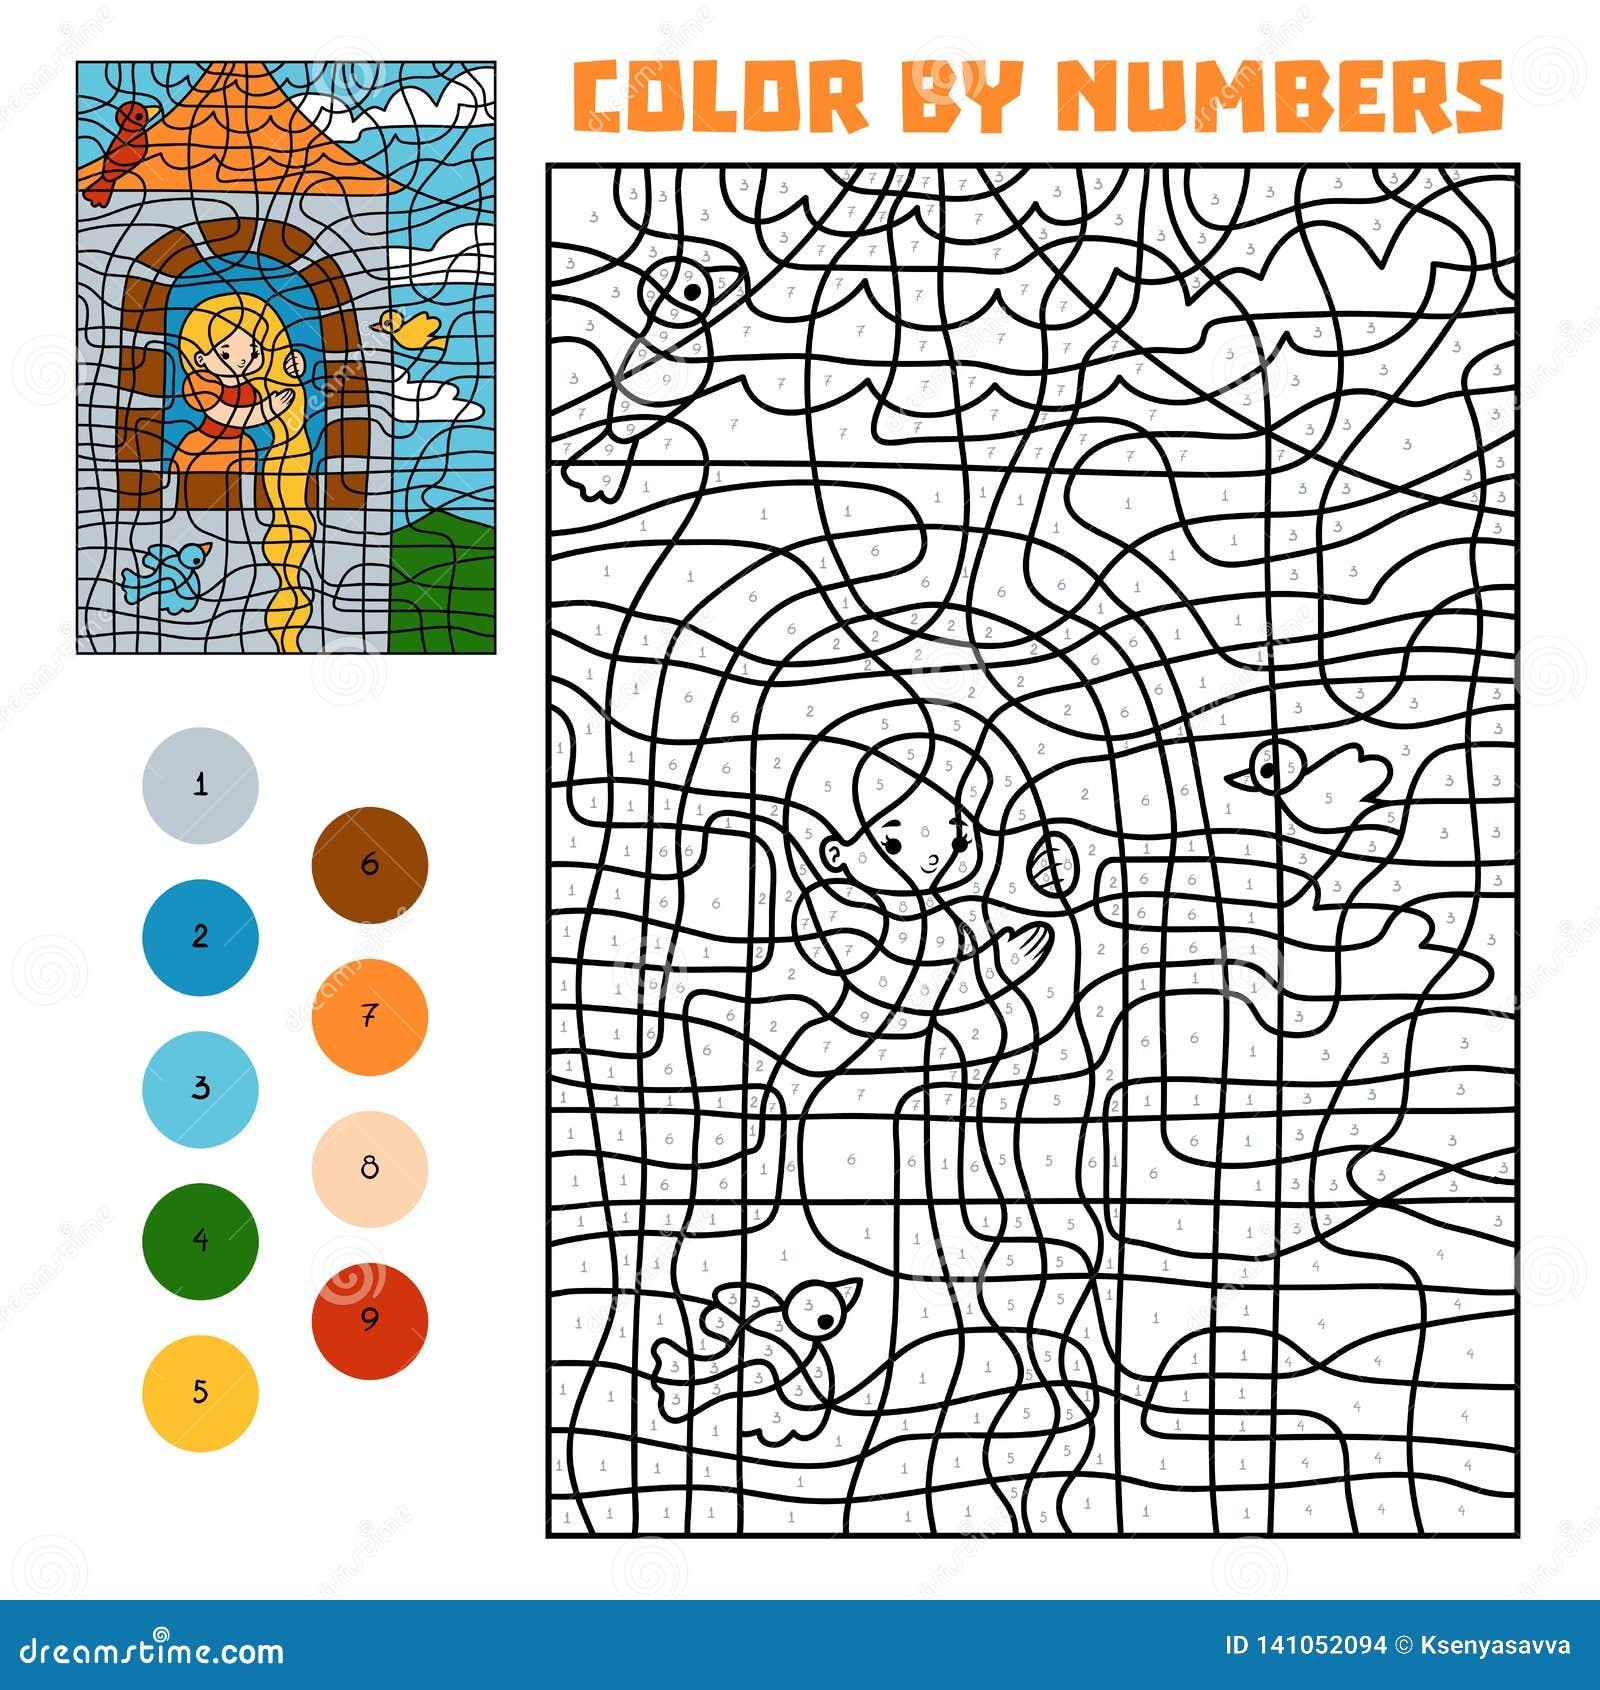 Farbe durch Zahl Märchen Rapunzel im Turm